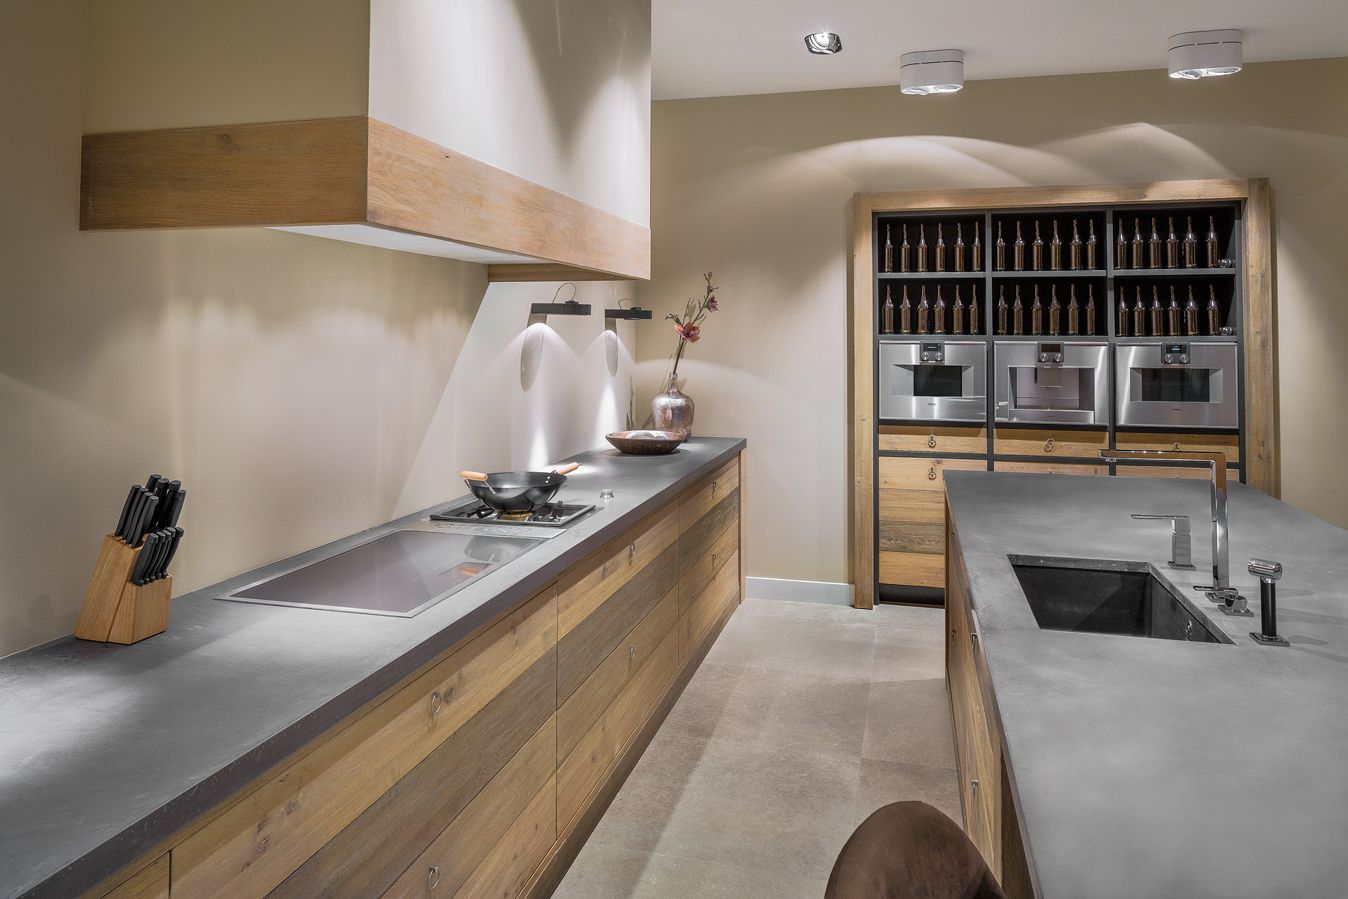 moderne keuken met betonnen aanrecht tinello. Black Bedroom Furniture Sets. Home Design Ideas